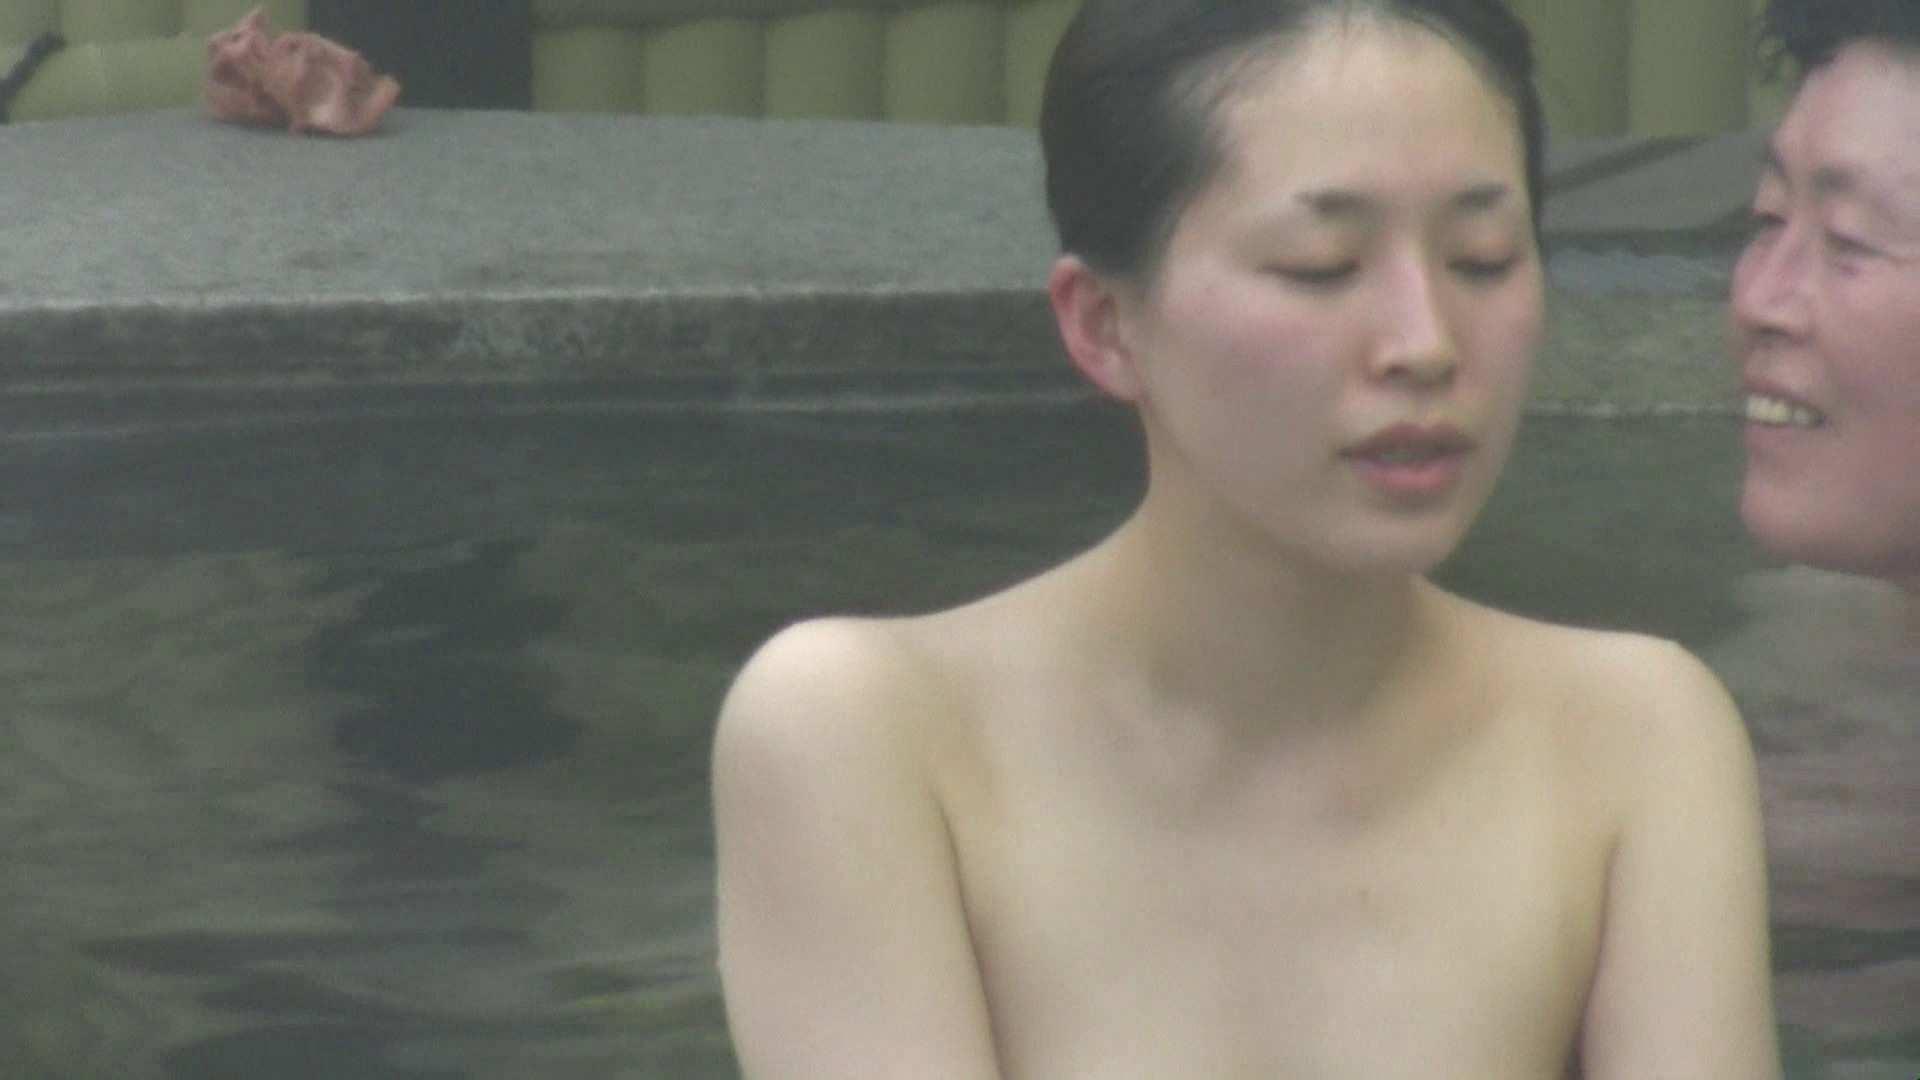 Aquaな露天風呂Vol.583 盗撮シリーズ | 露天風呂編  97PIX 41